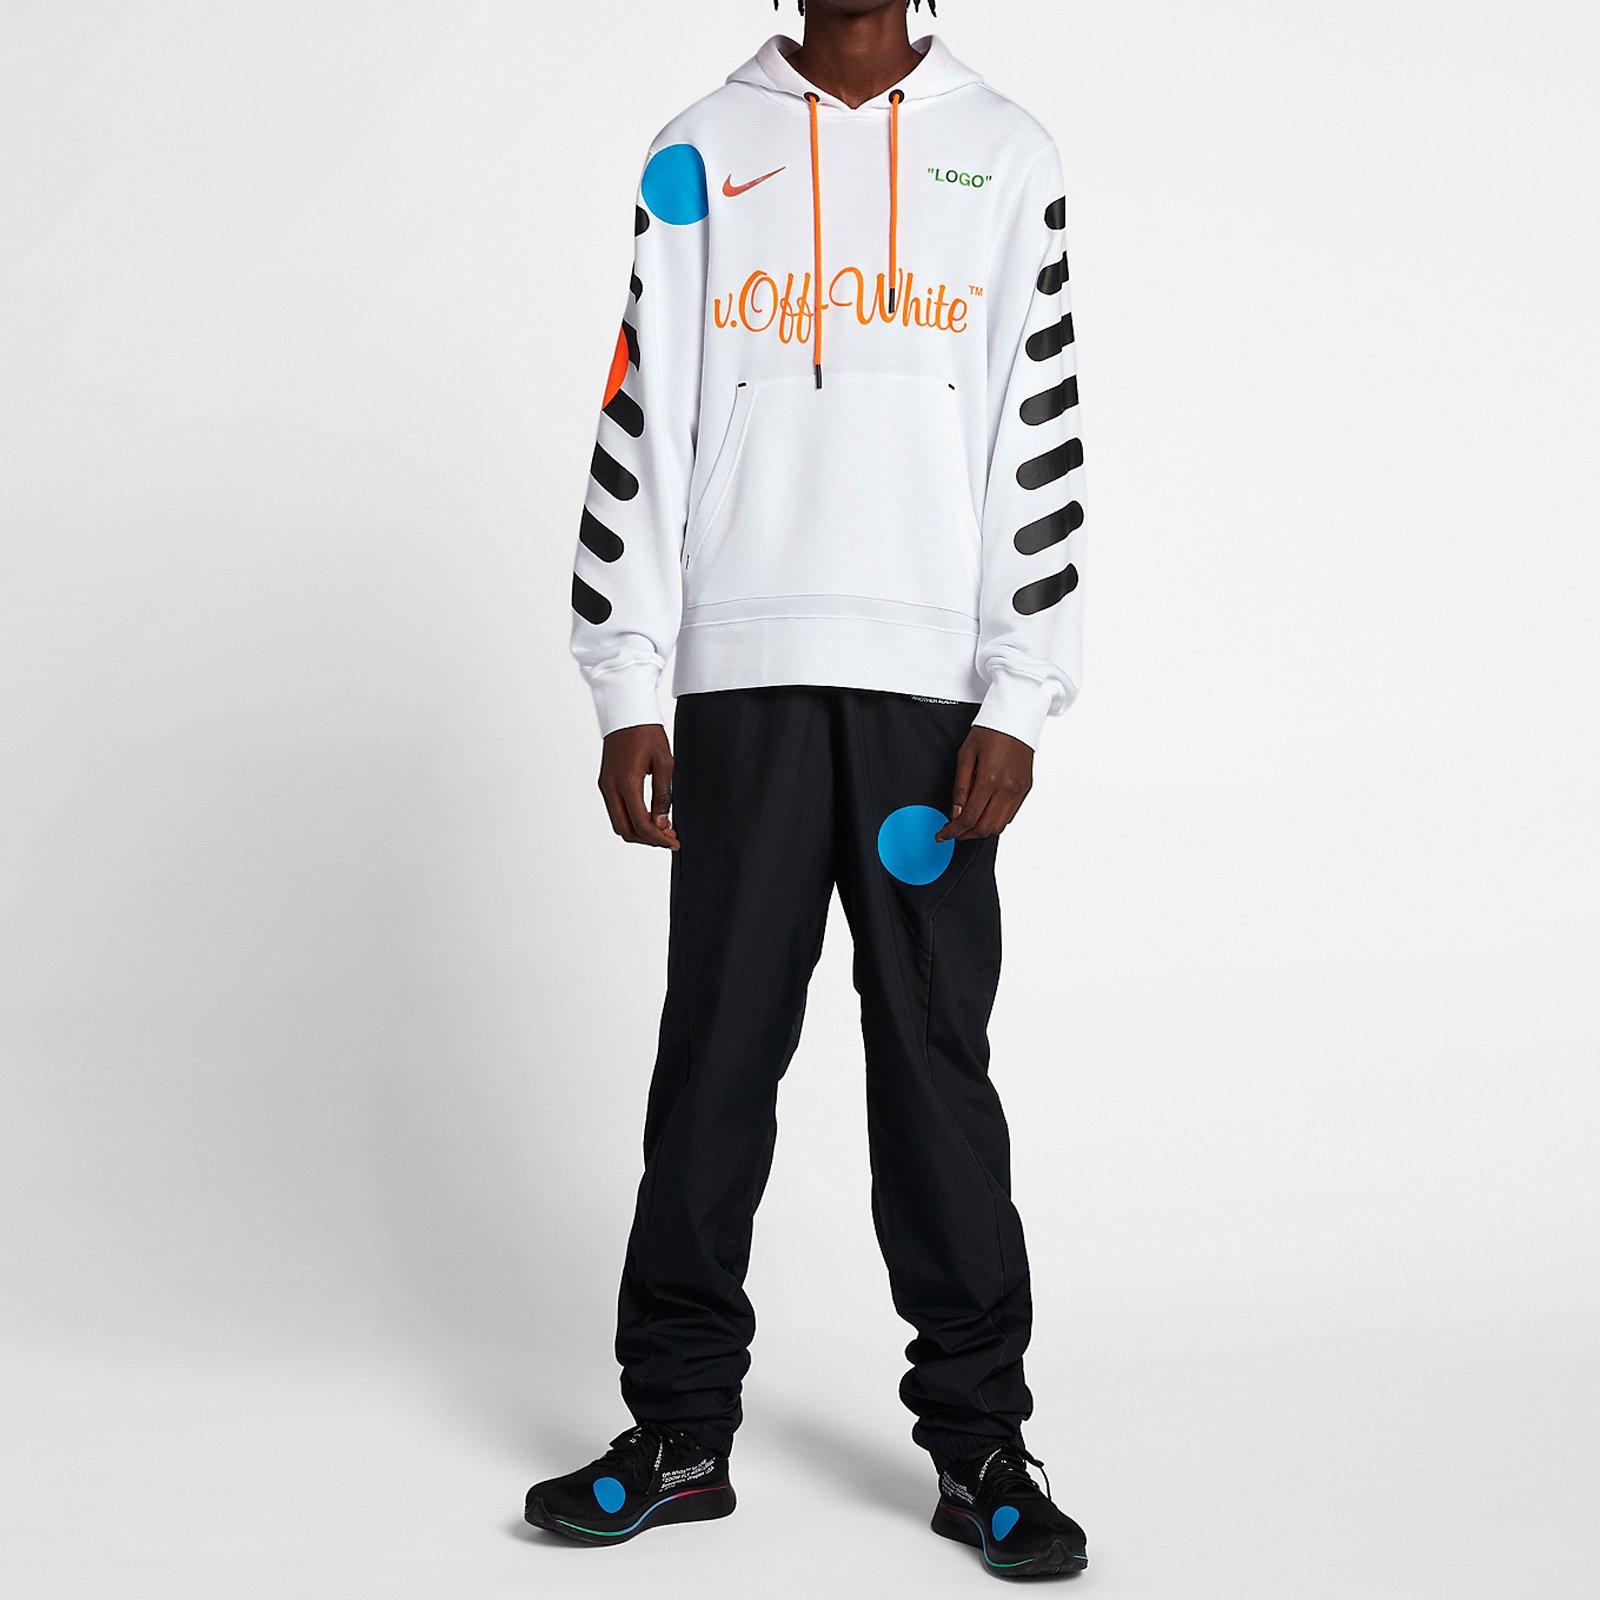 Platillo cascada Cereza  Nike Nike X Off White Hoodie - Aa3257-100 - Sneakersnstuff I Sneakers &  Streetwear online seit 1999